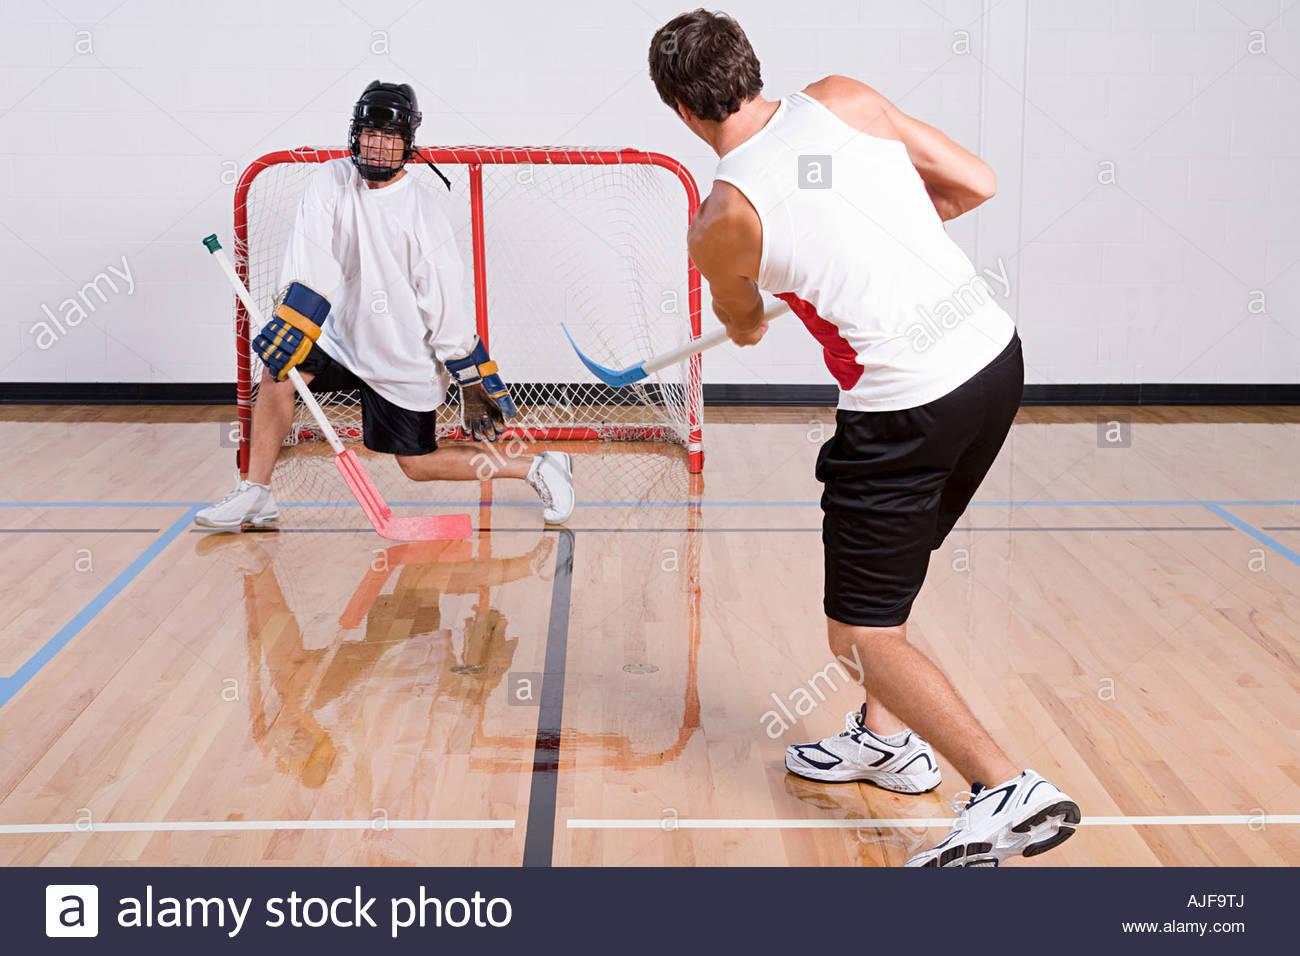 Hockey goalkeeper making a save - Stock Image